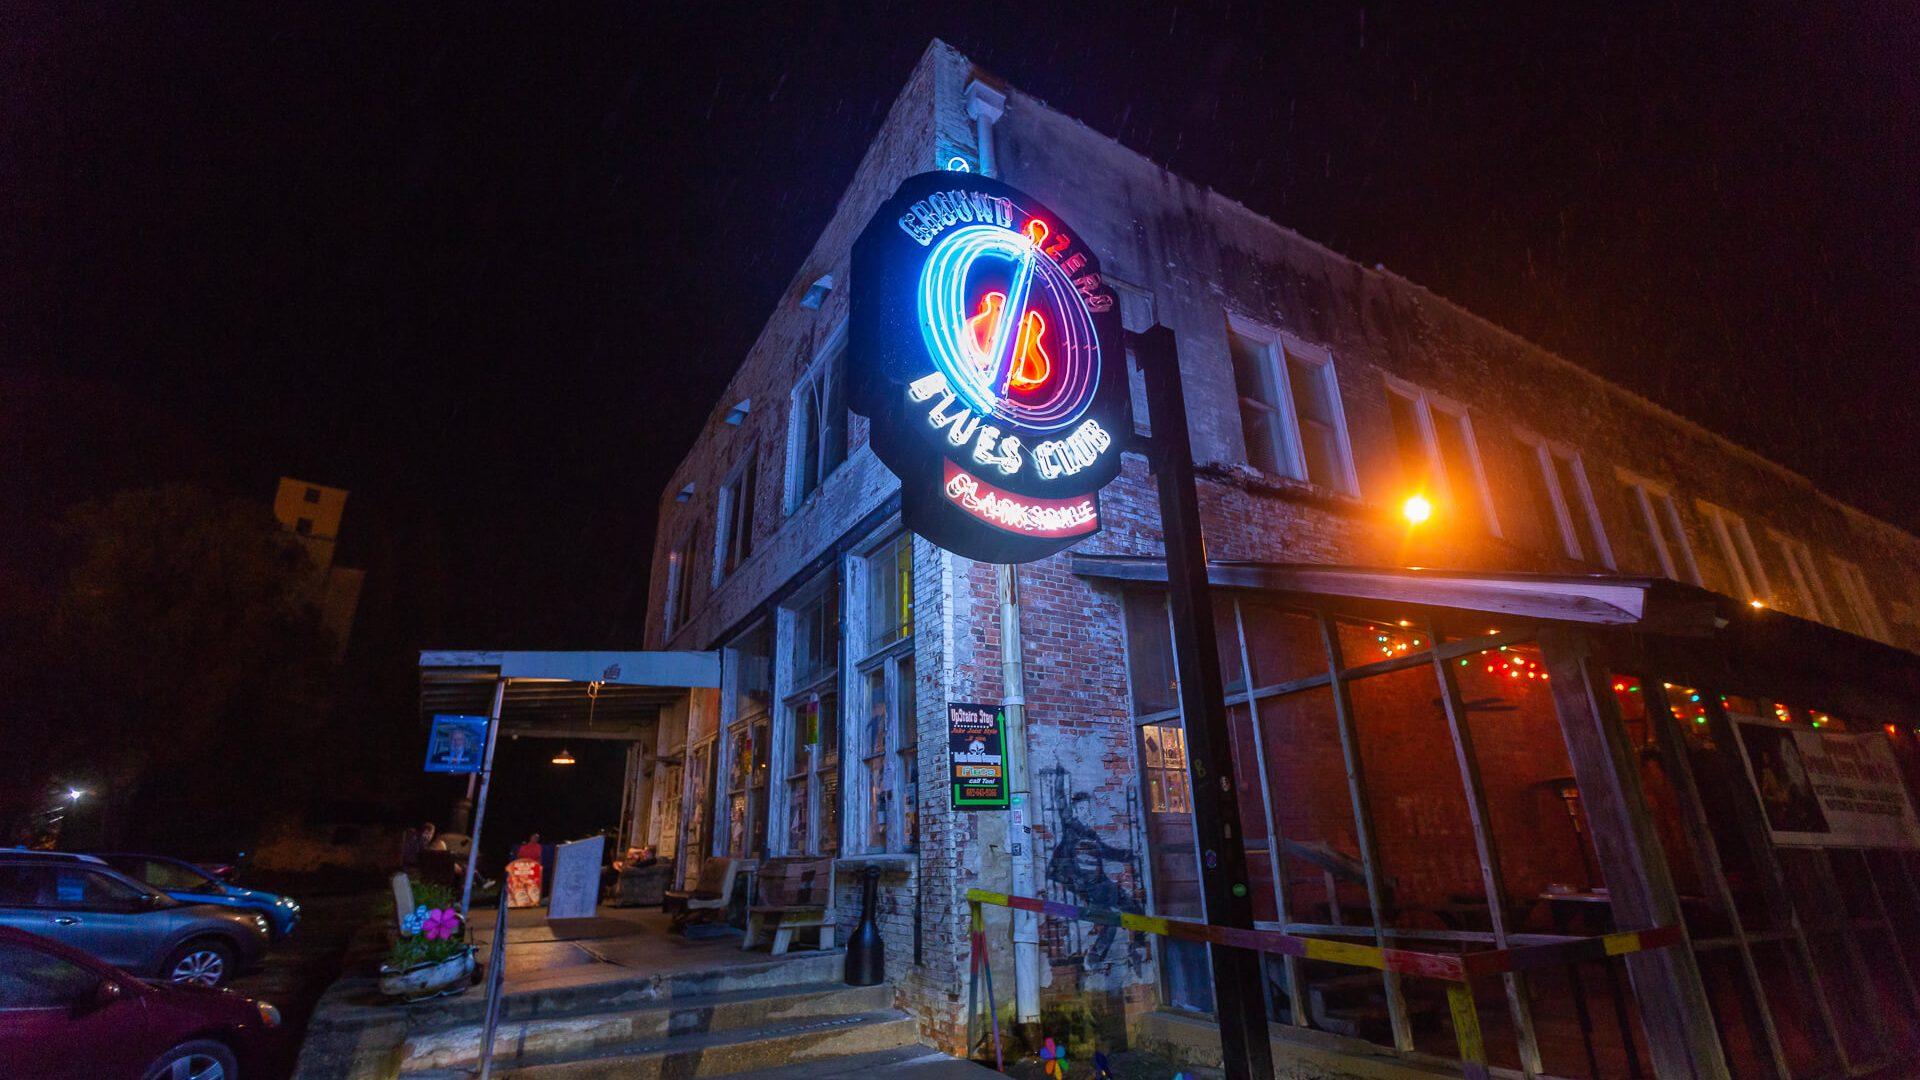 Clarksdale nightlife